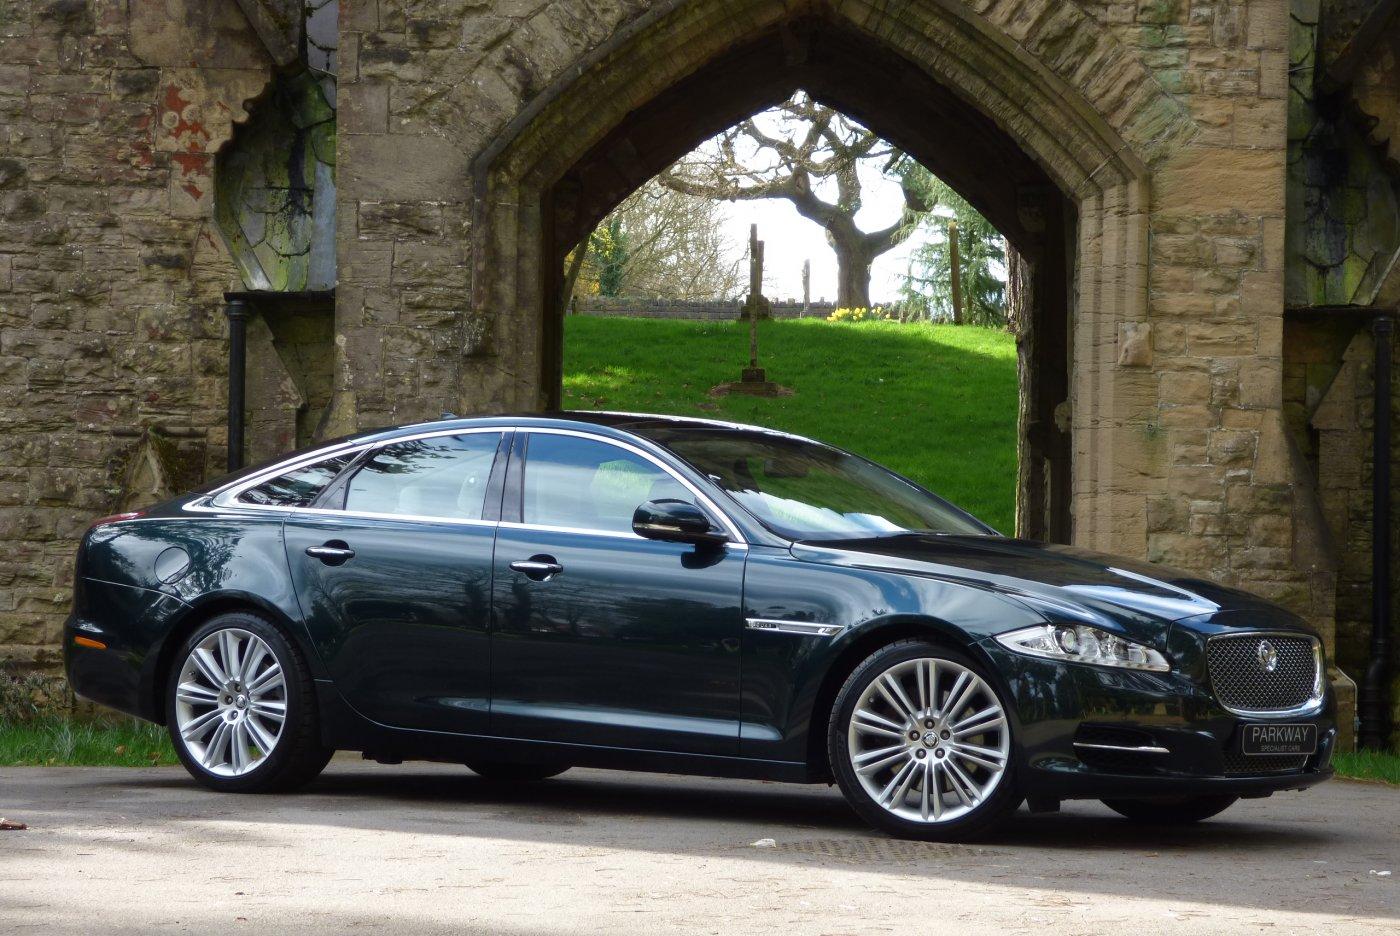 swb s gkm bhp luxury saloon jaguar ss vehicles g td xj automatic diesel